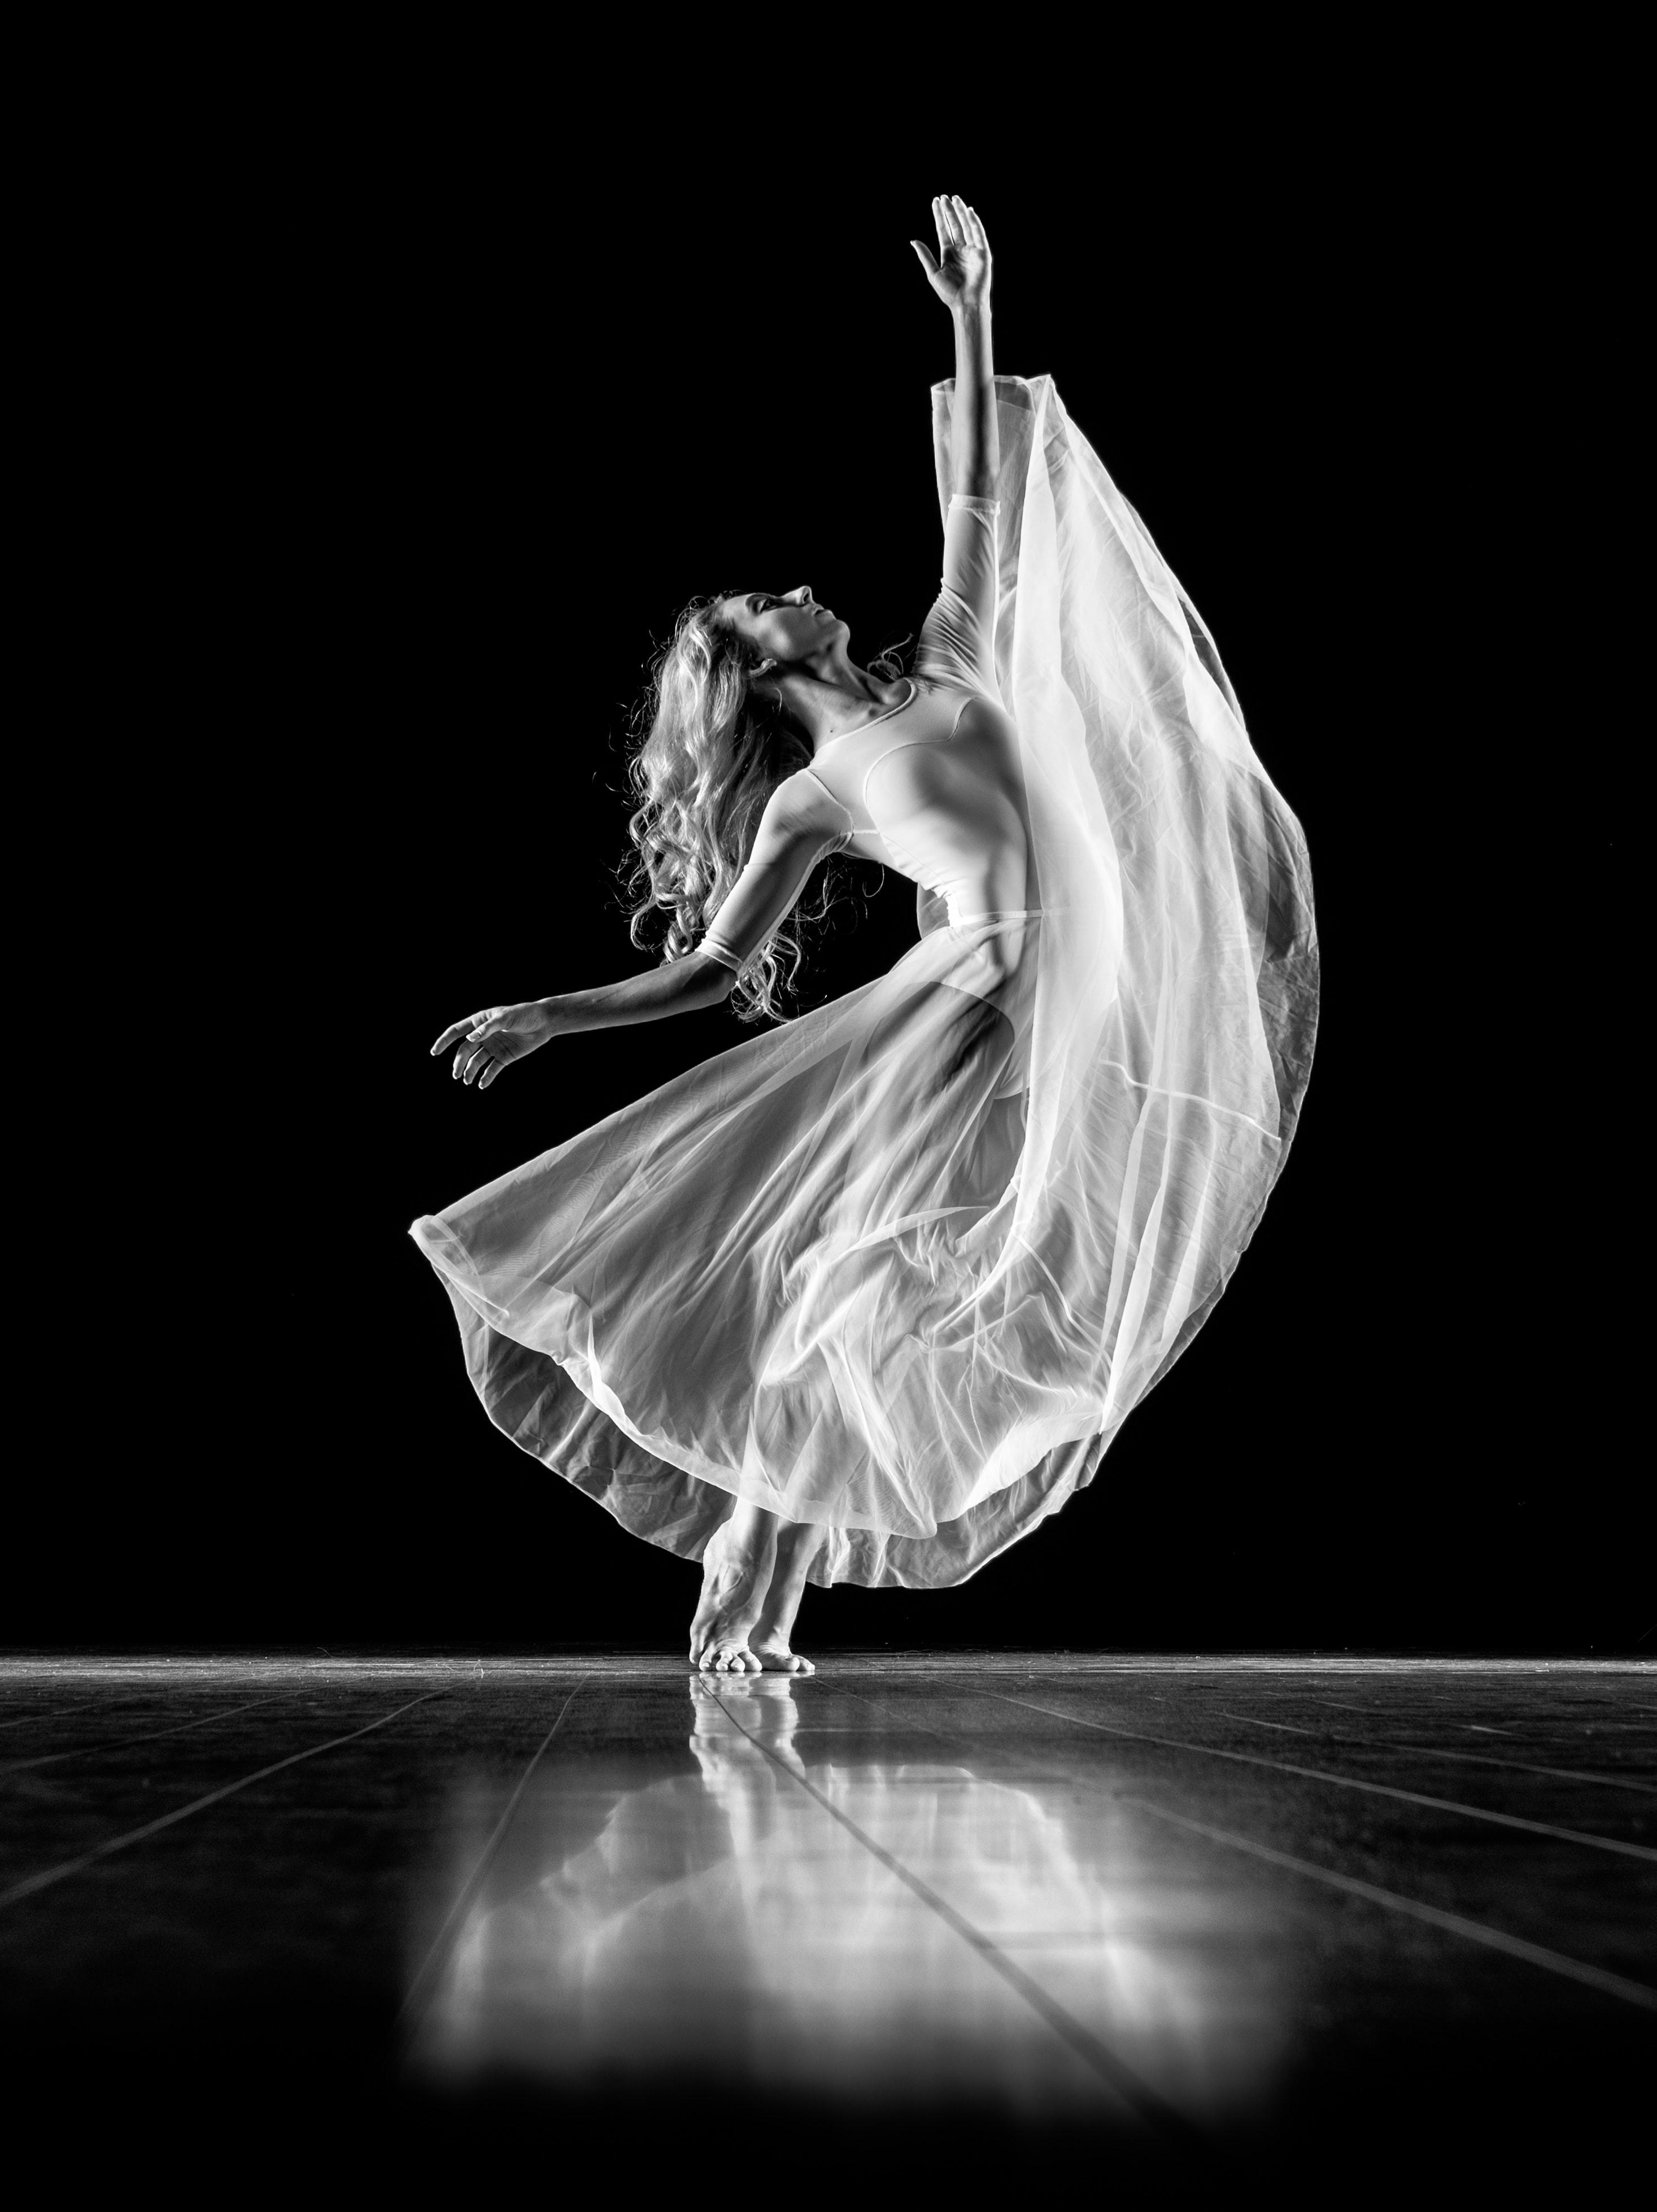 Photography Of Dancing Ballerina Photo Free Dance Image On Unsplash